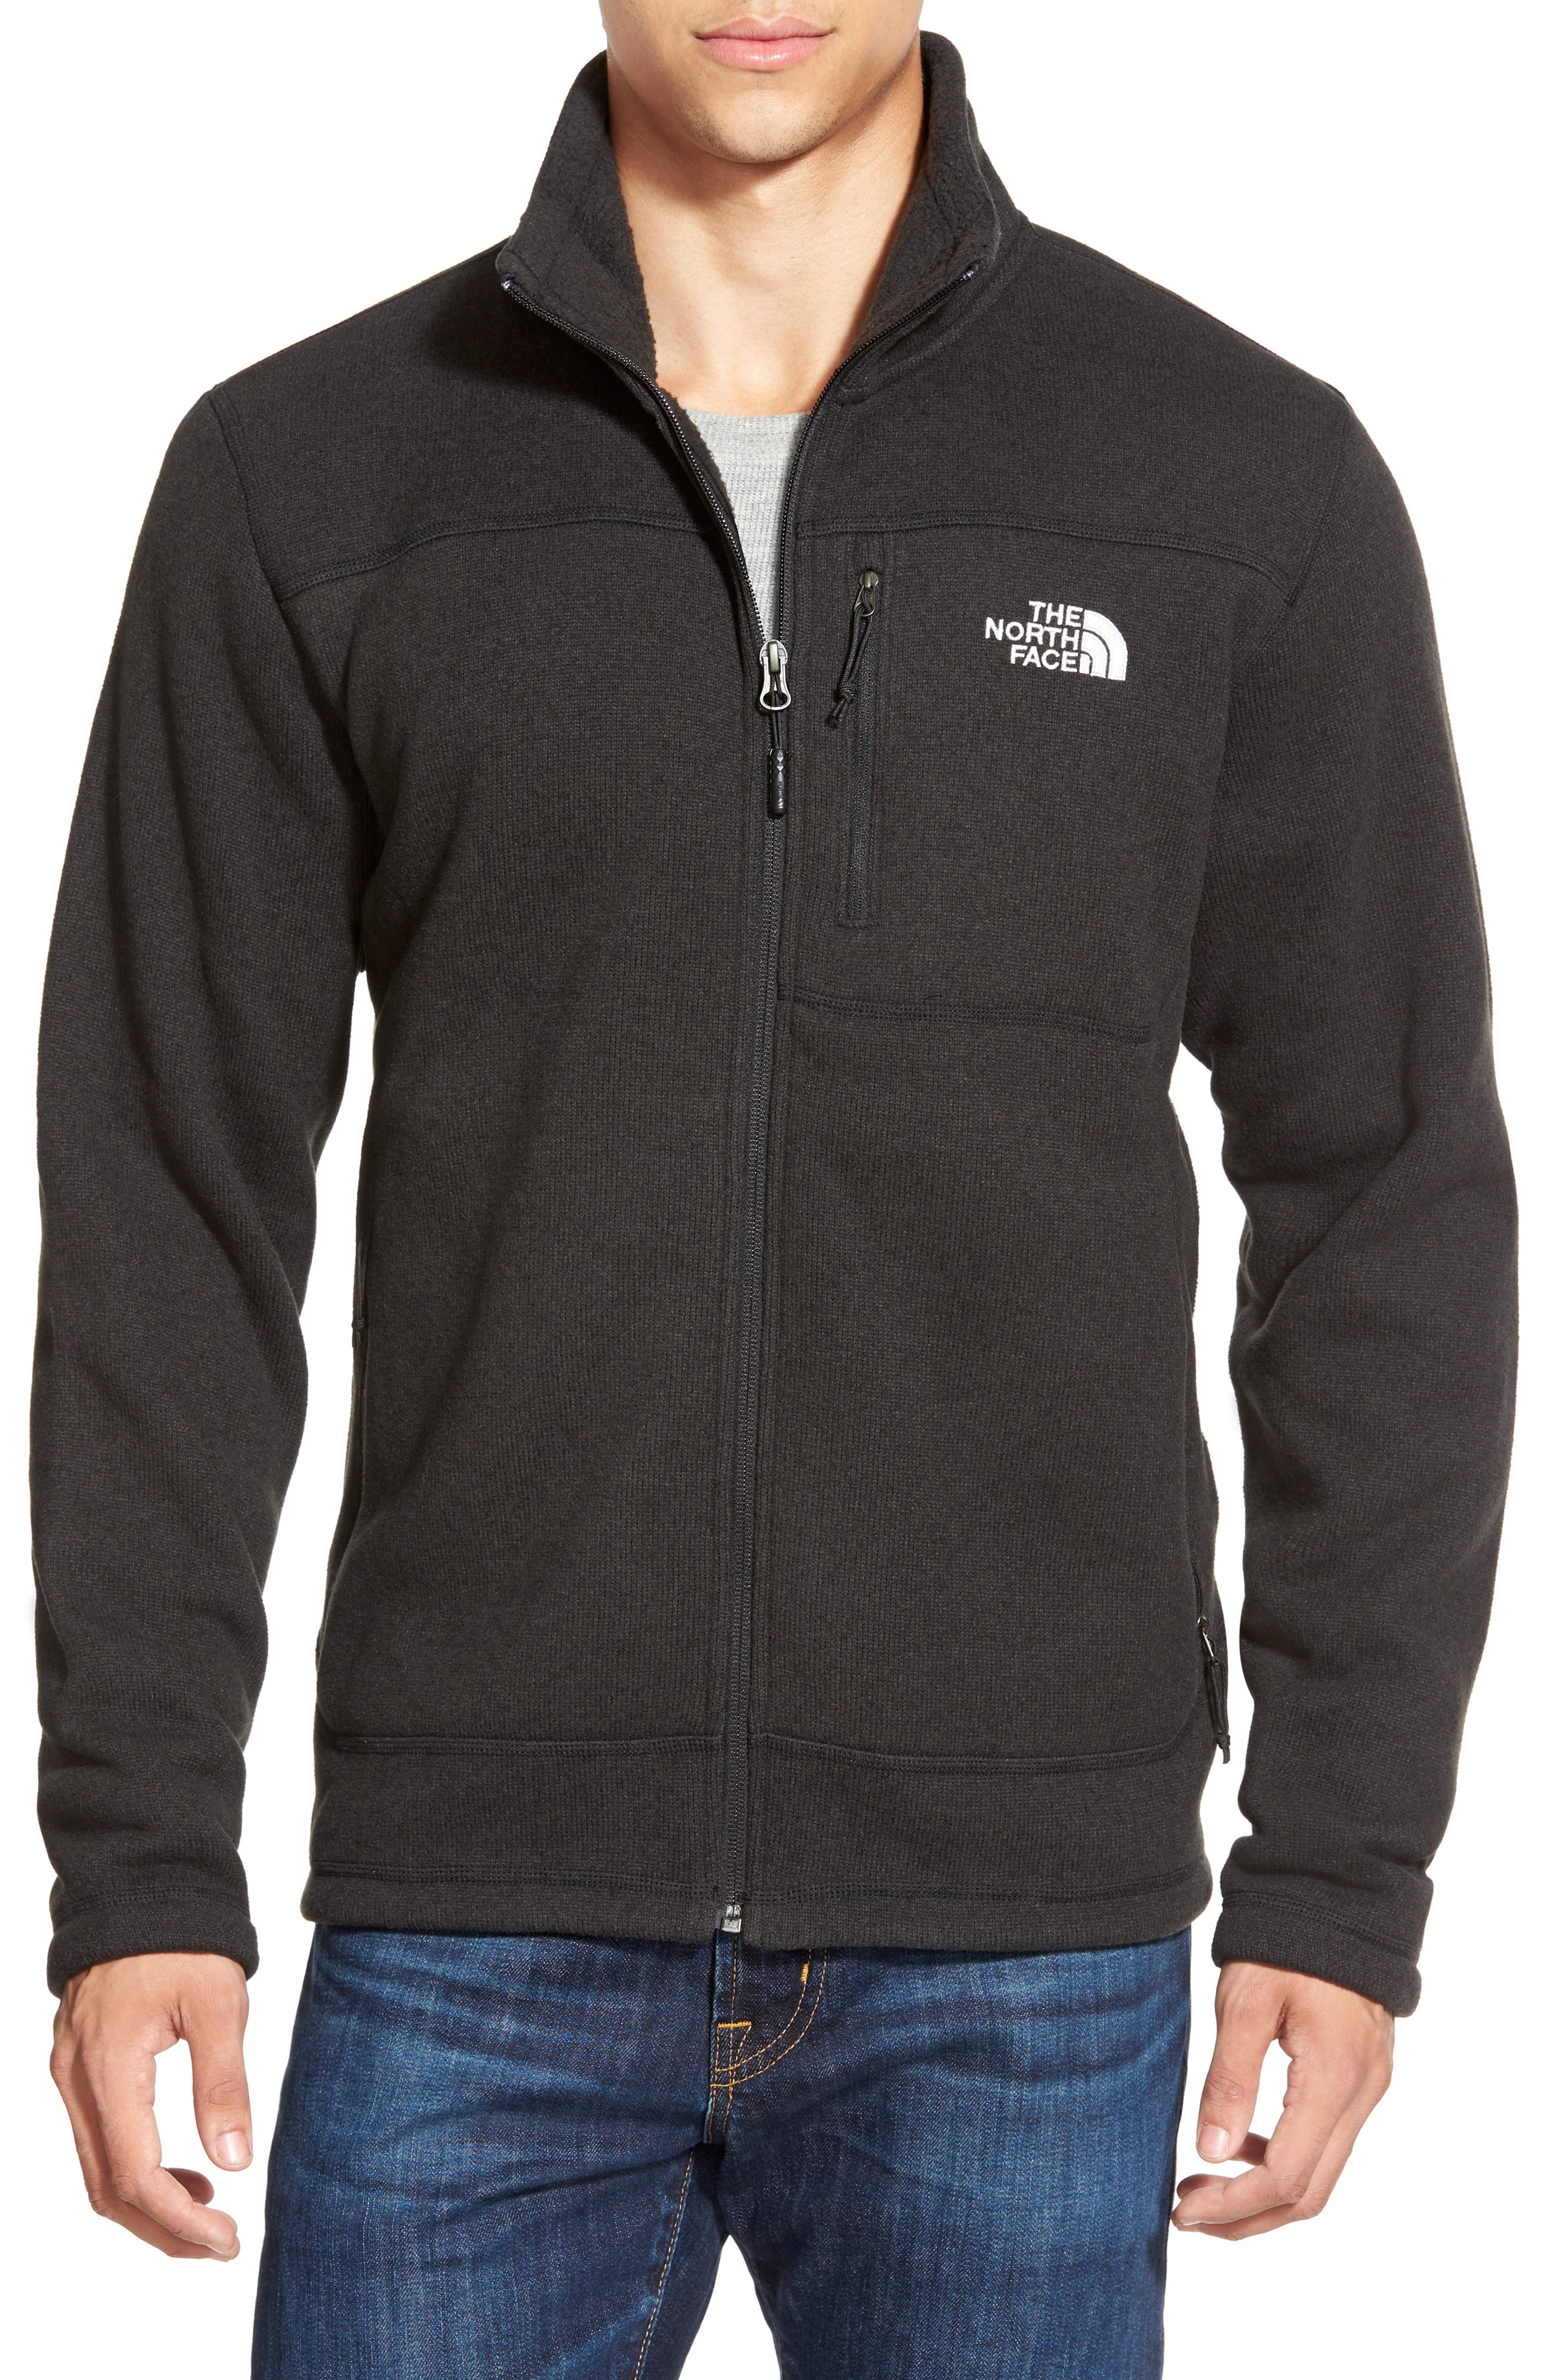 The North Face 'Gordon Lyons' Zip Fleece Jacket